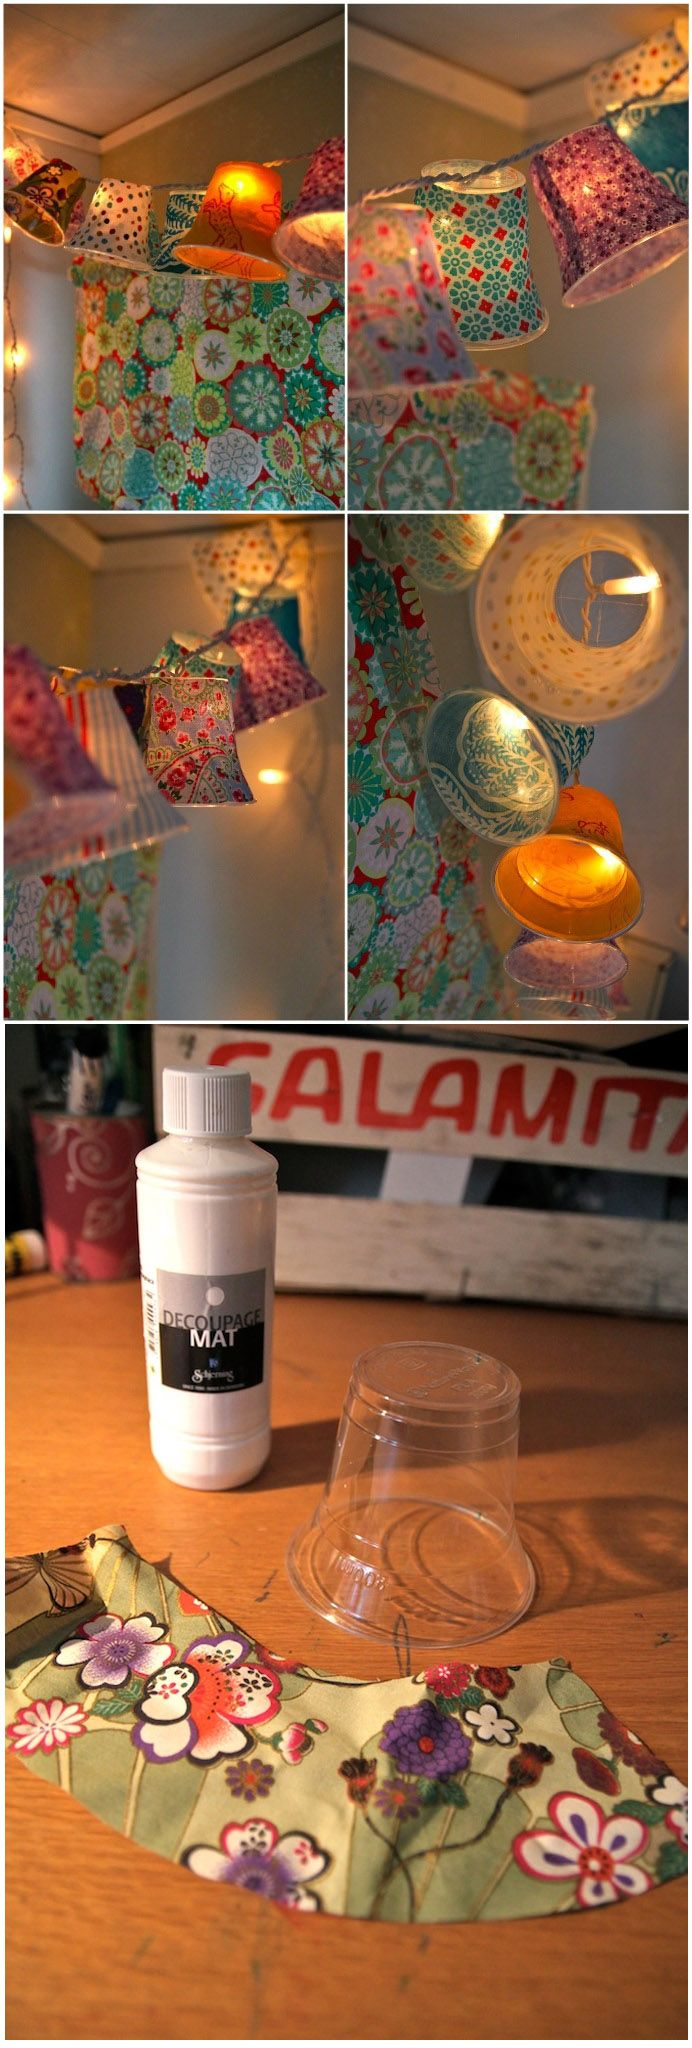 Plastic cup pendant lamps. // guirlande de lumière avec des gobelets et du tissu ( http://rebeccasdiy.blogspot.ca/2011/12/diy-ljusslinga-med-lampskarmar.html )